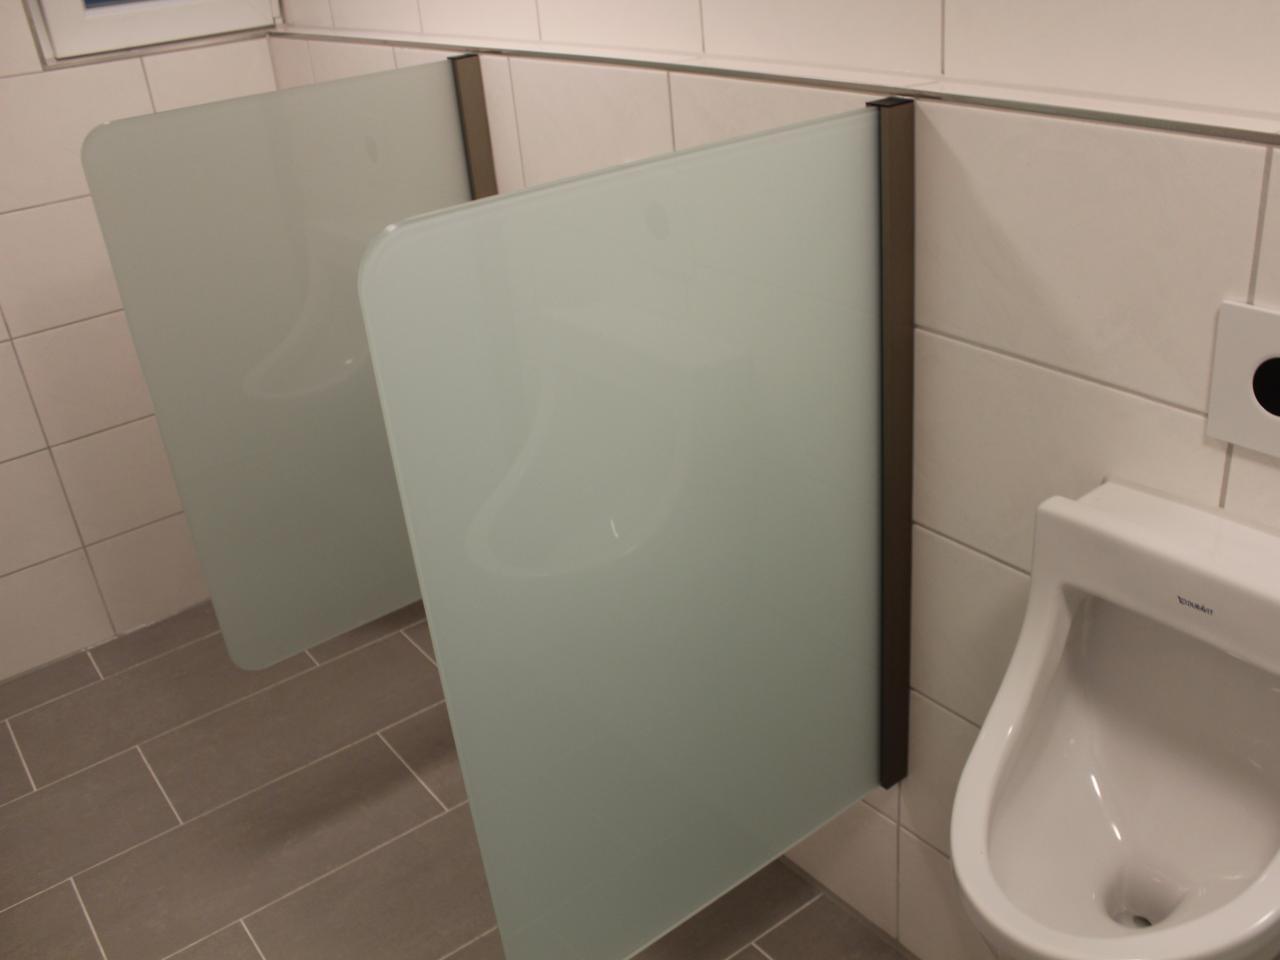 trennwand f r toilette aus glas glasprofi24. Black Bedroom Furniture Sets. Home Design Ideas